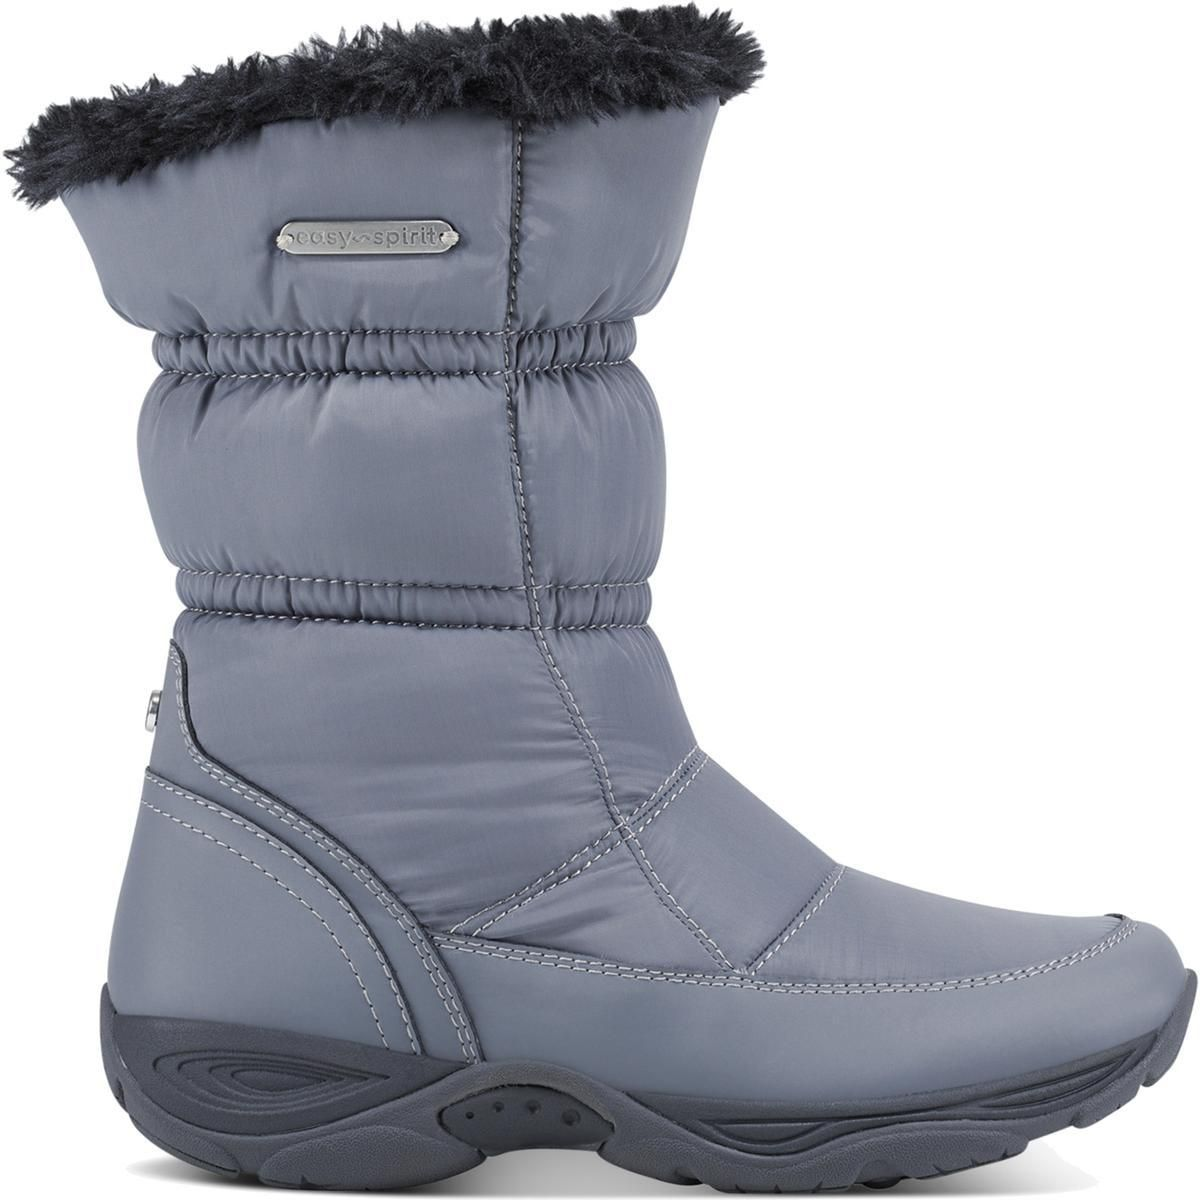 Easy Spirit Womens Winter Boots Gray Size 9.5 Medium (B,M)